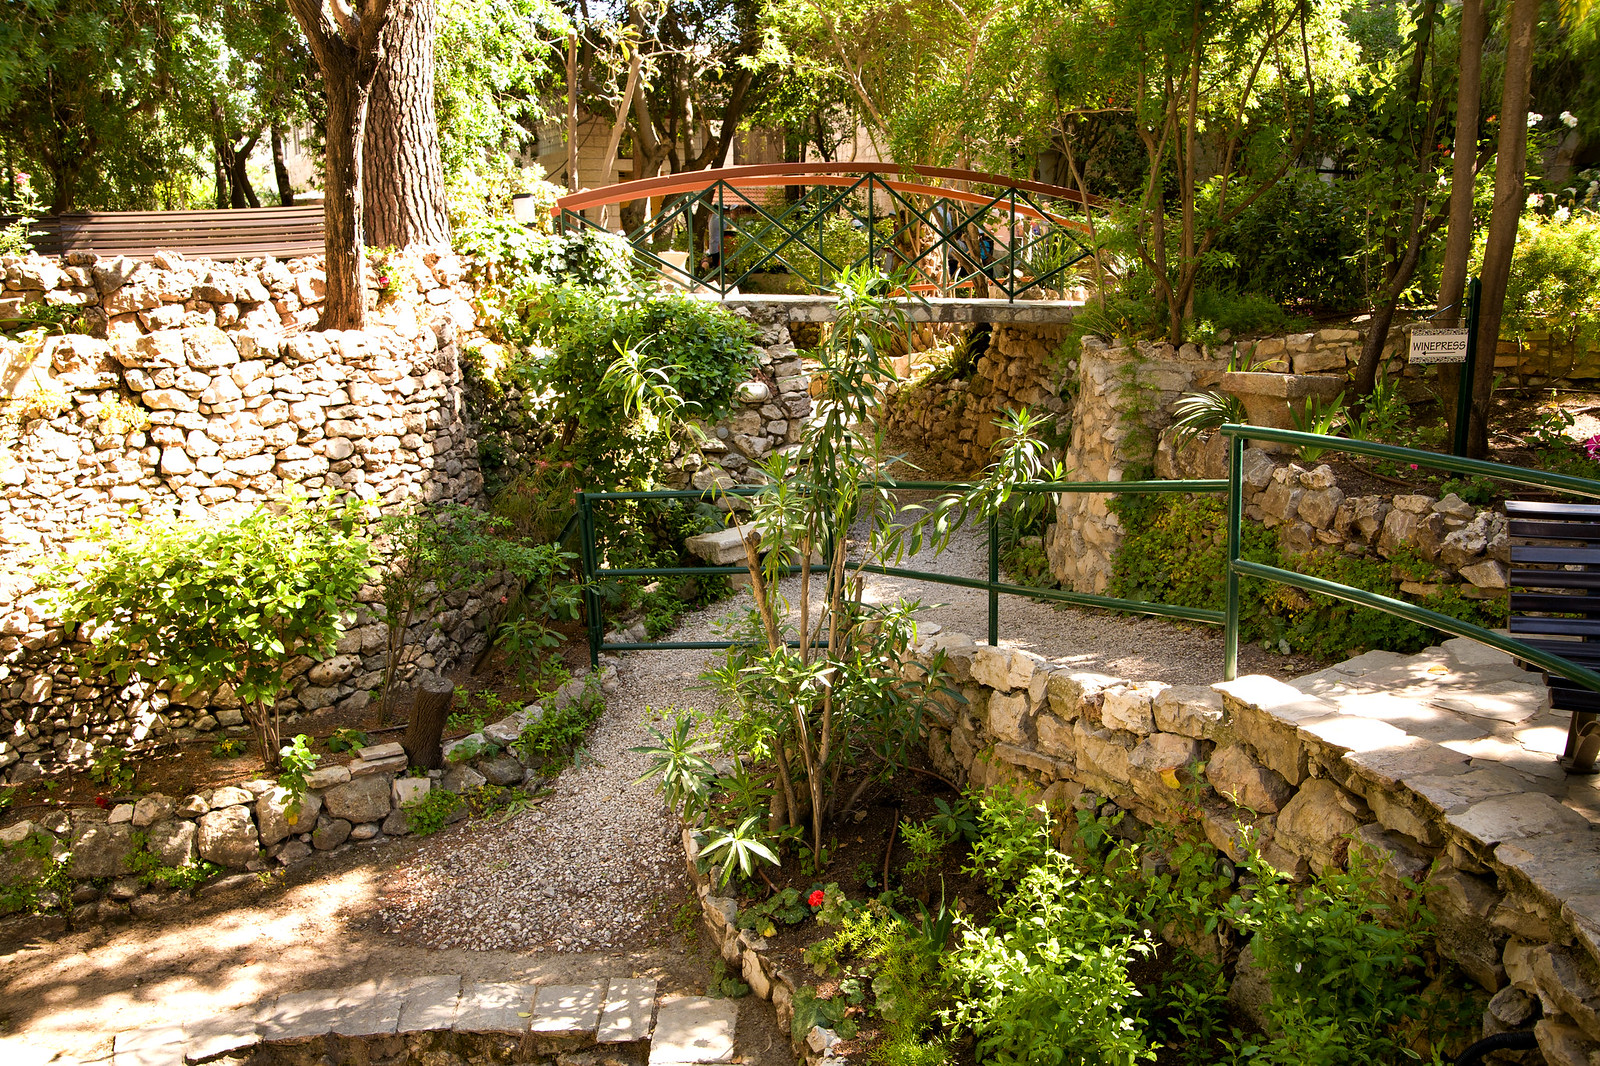 Jerusalem_Garden Tomb_6_Noam Chen_IMOT